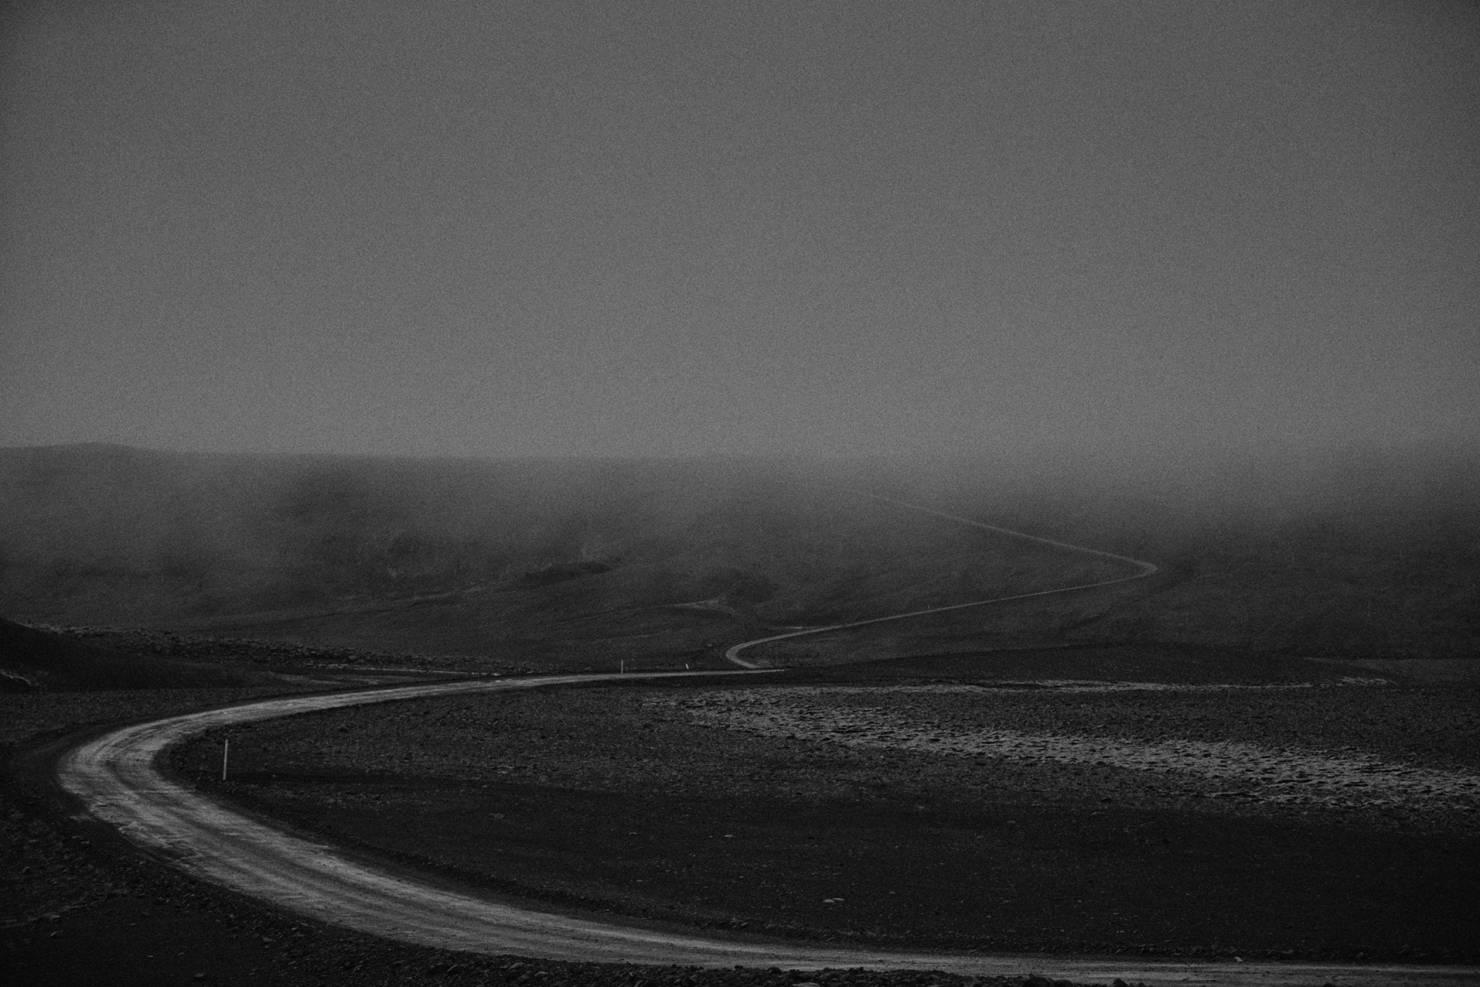 patrick_schuttler_landscape_iceland_004-aecf97519732768cf4678b551110b3e3